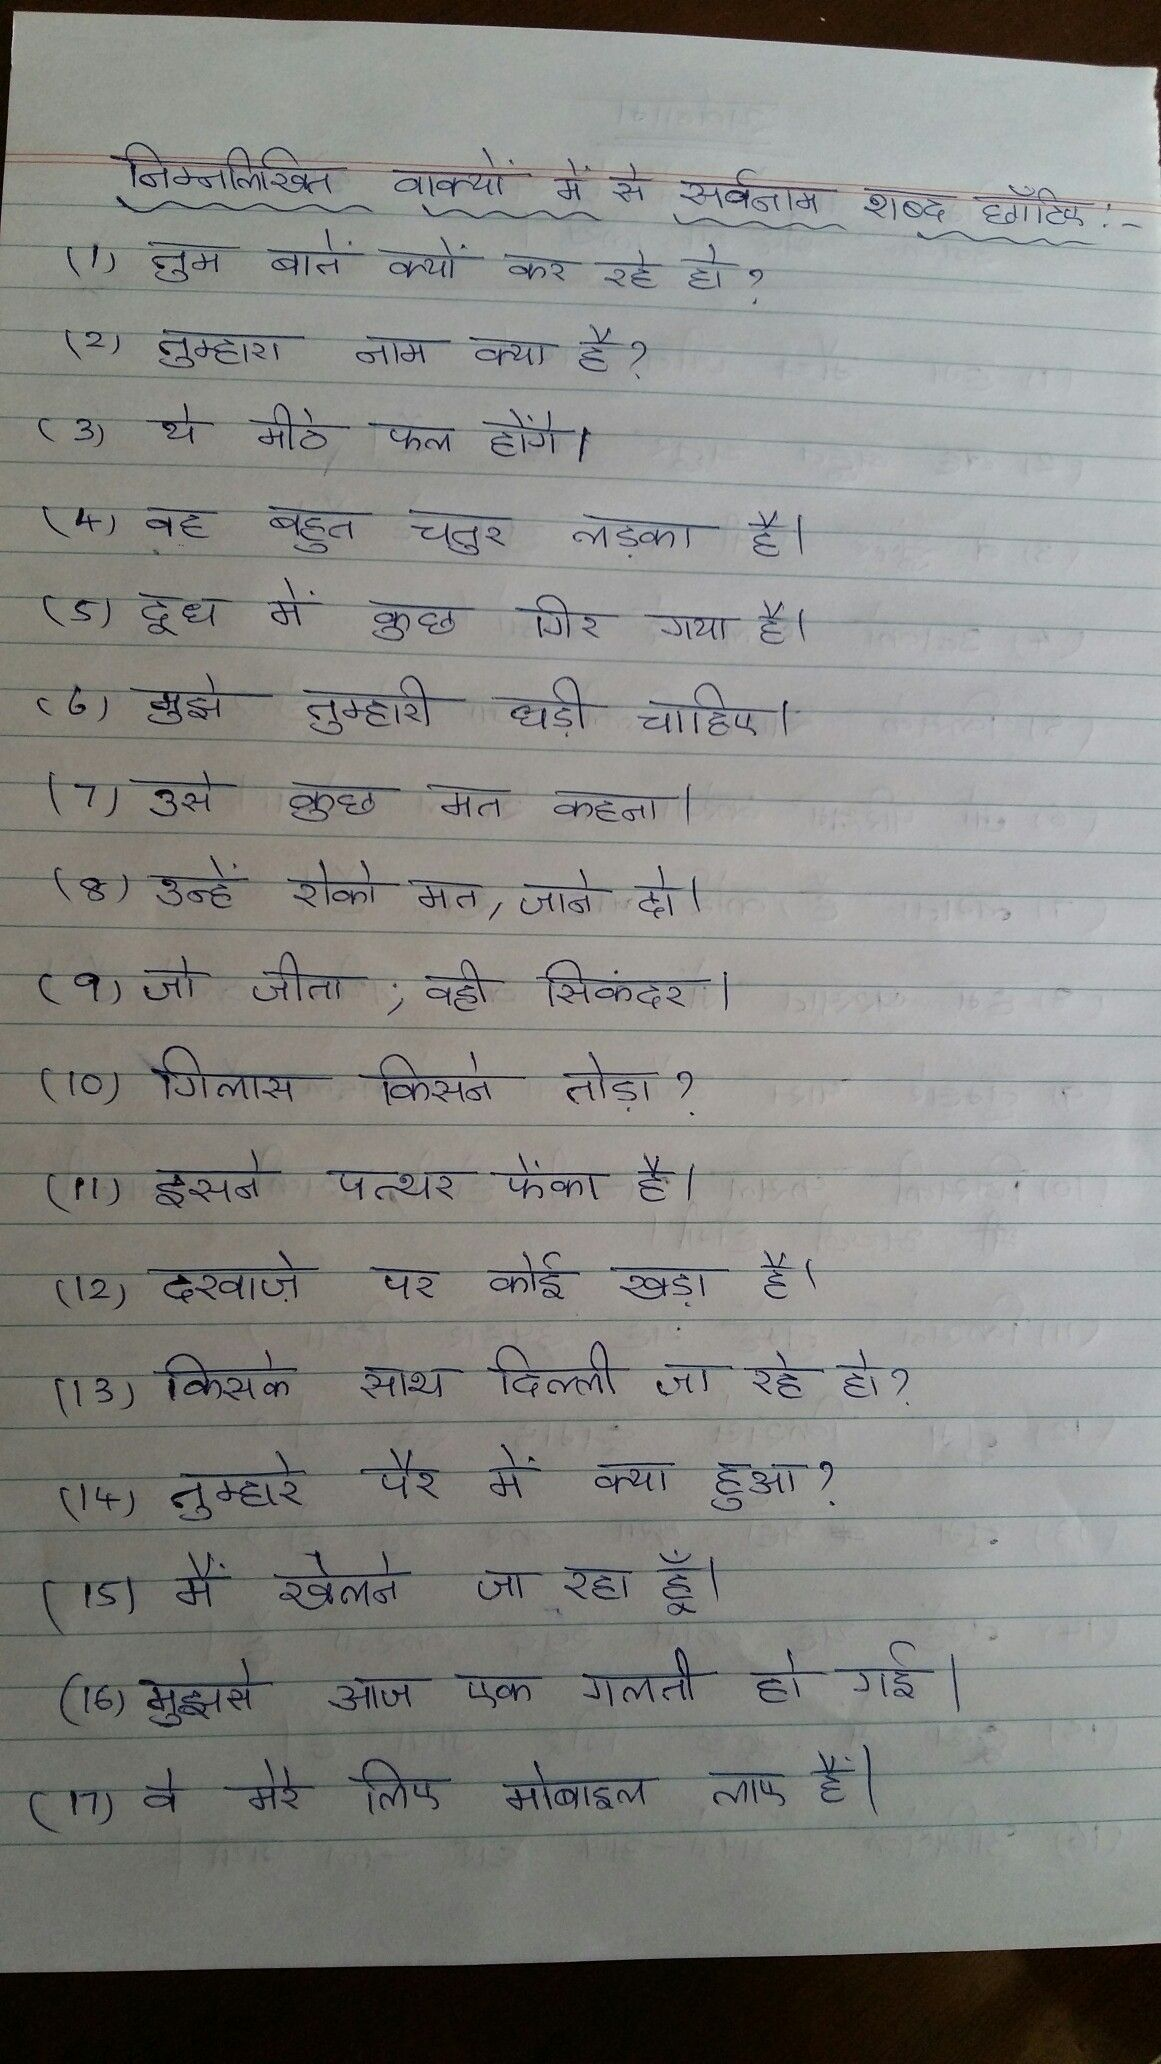 worksheet Hindi Grammar Worksheets For Class 8 Cbse hindi grammar sarvanam worksheets pnv for school kids pnv